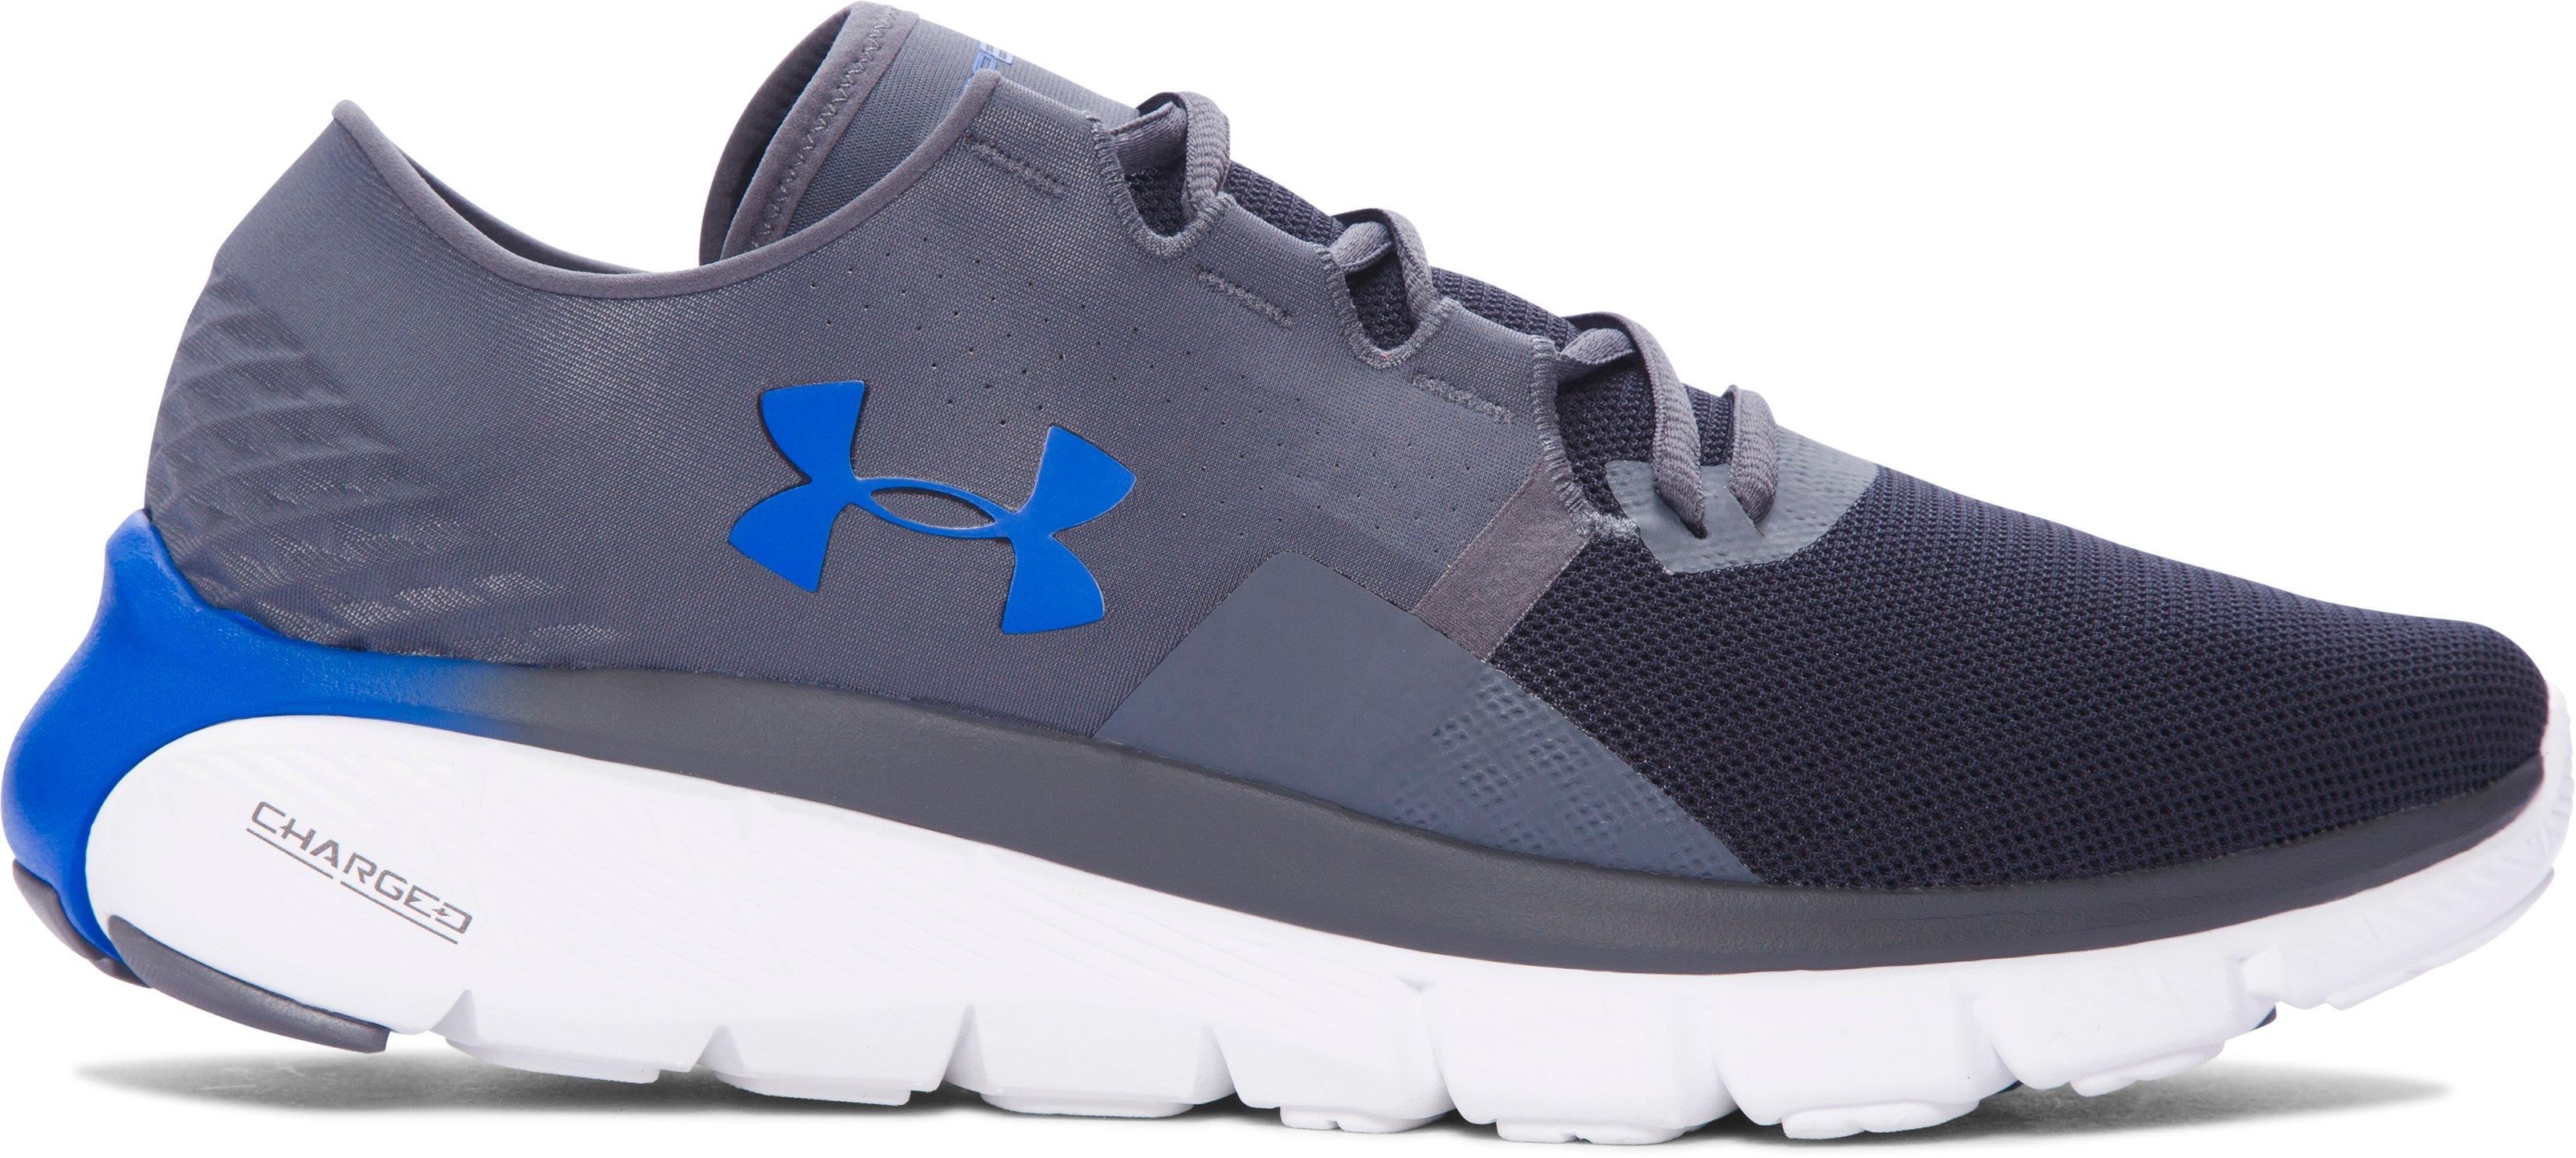 Zapatillas de Running UA SpeedForm® Fortis 2.1 para Hombre, 360 degree view